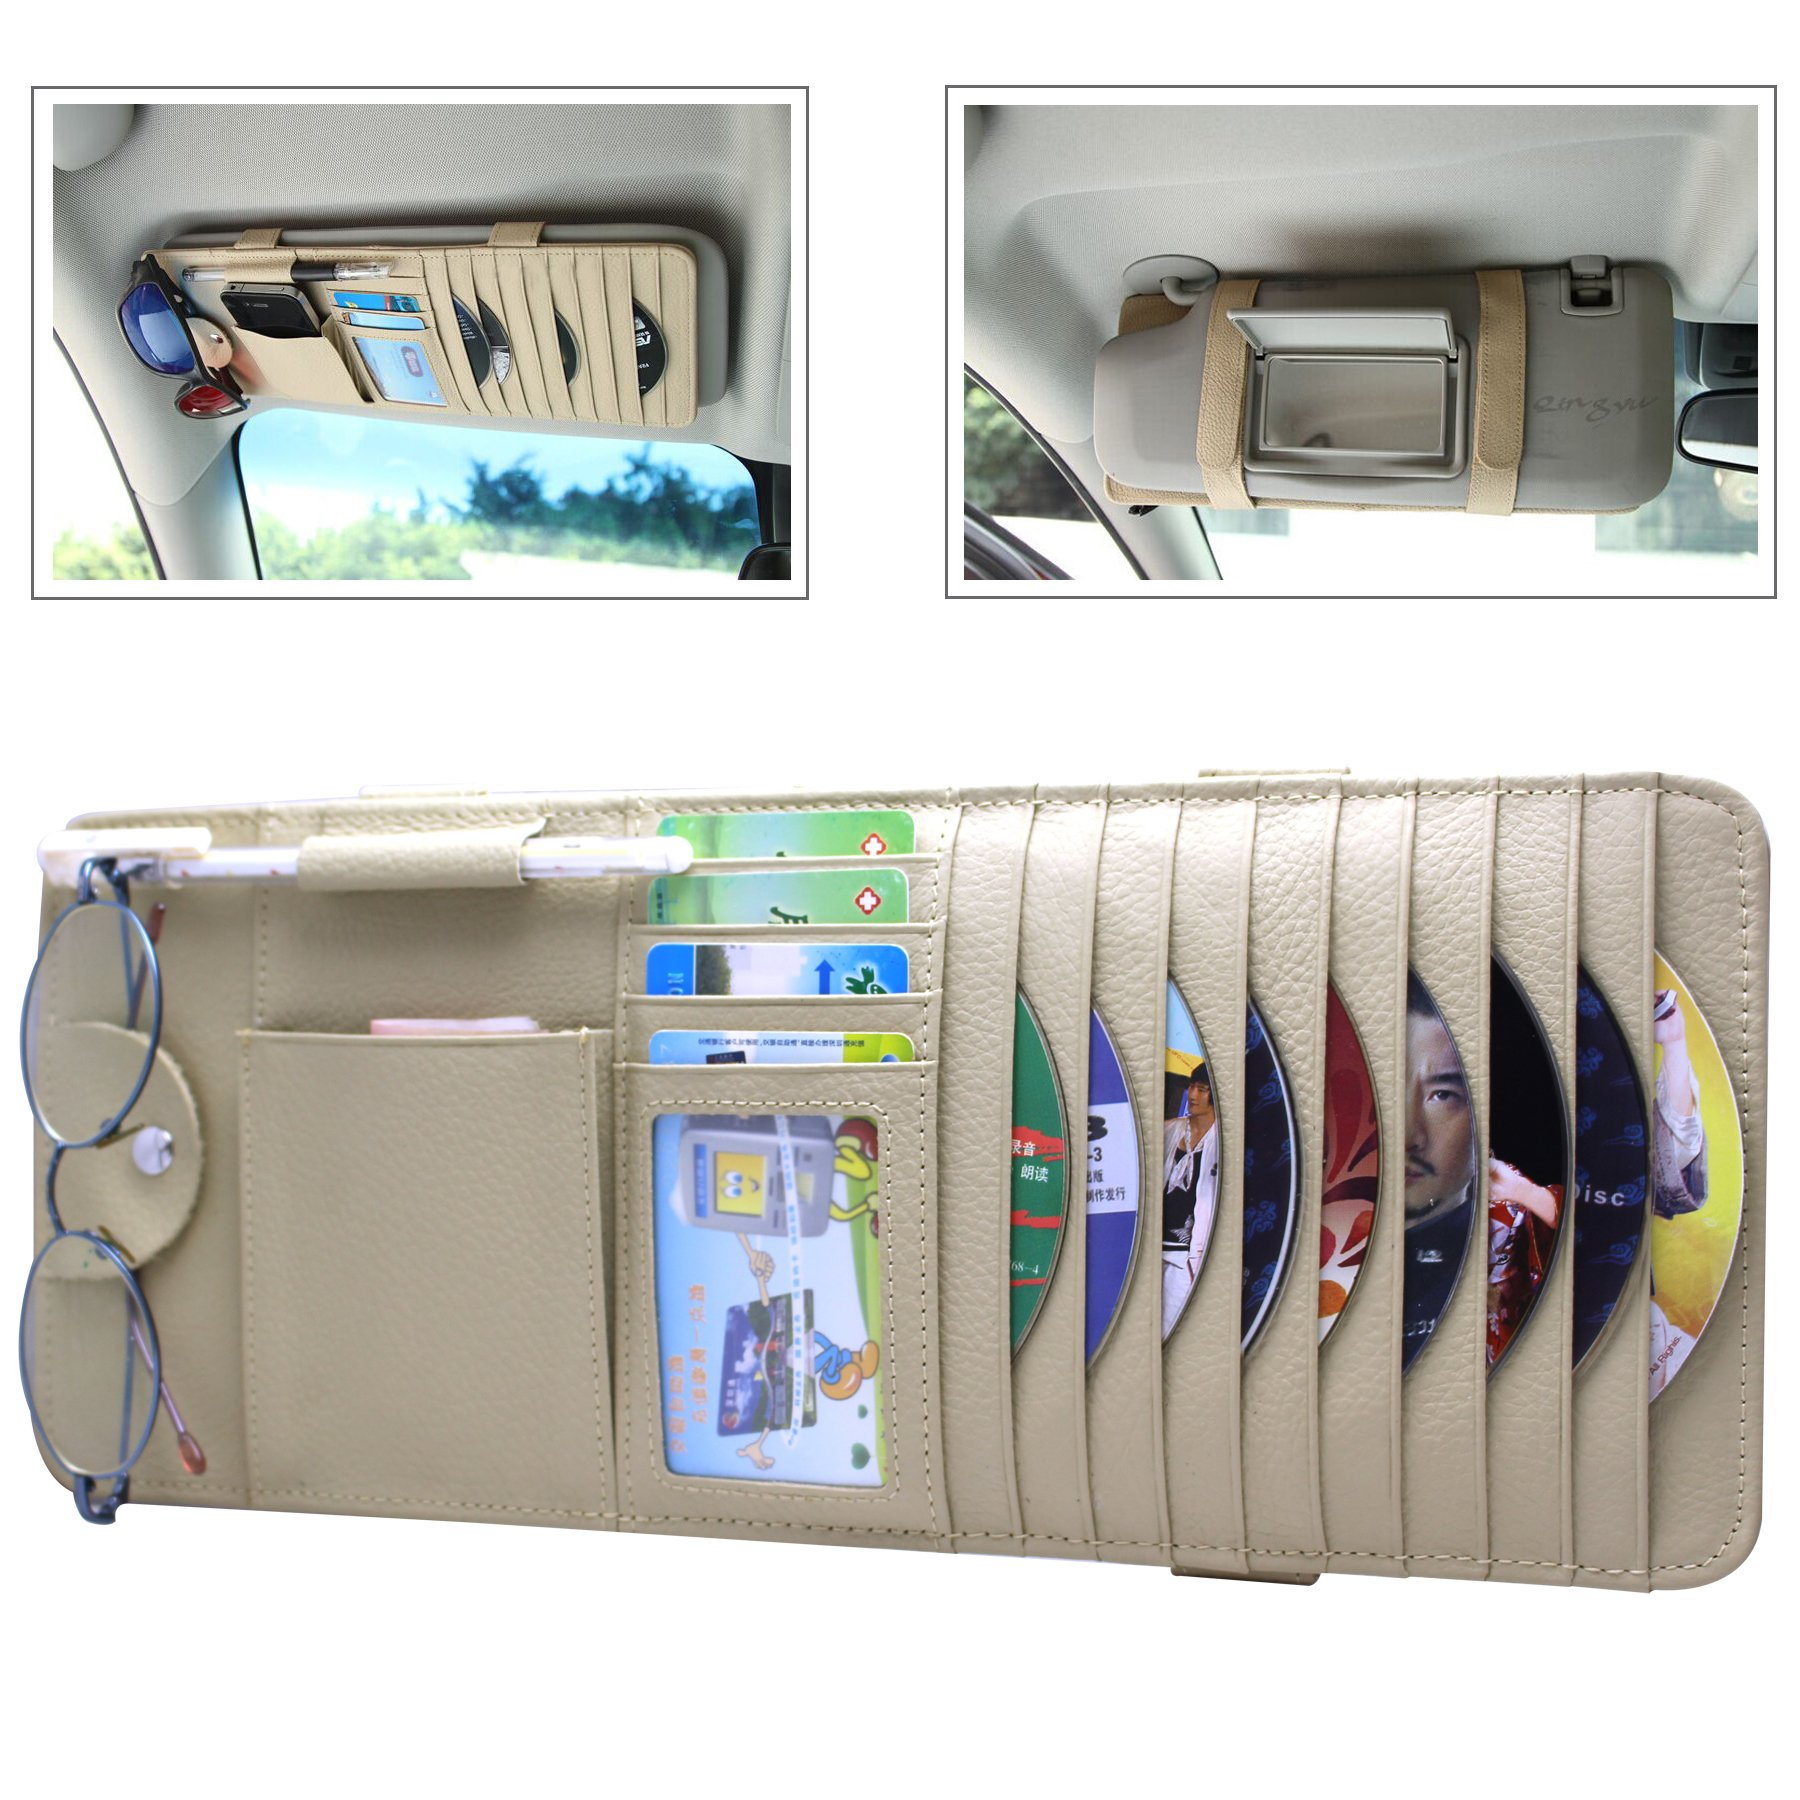 RAYSUN Gunuine Leather Auto Vehicle Sun Visor Organizer with 9 CD Slots + 4 Credit Card Pockets + 1 Glasses Holder + 1 Pen Holder + 1 Money Pocket